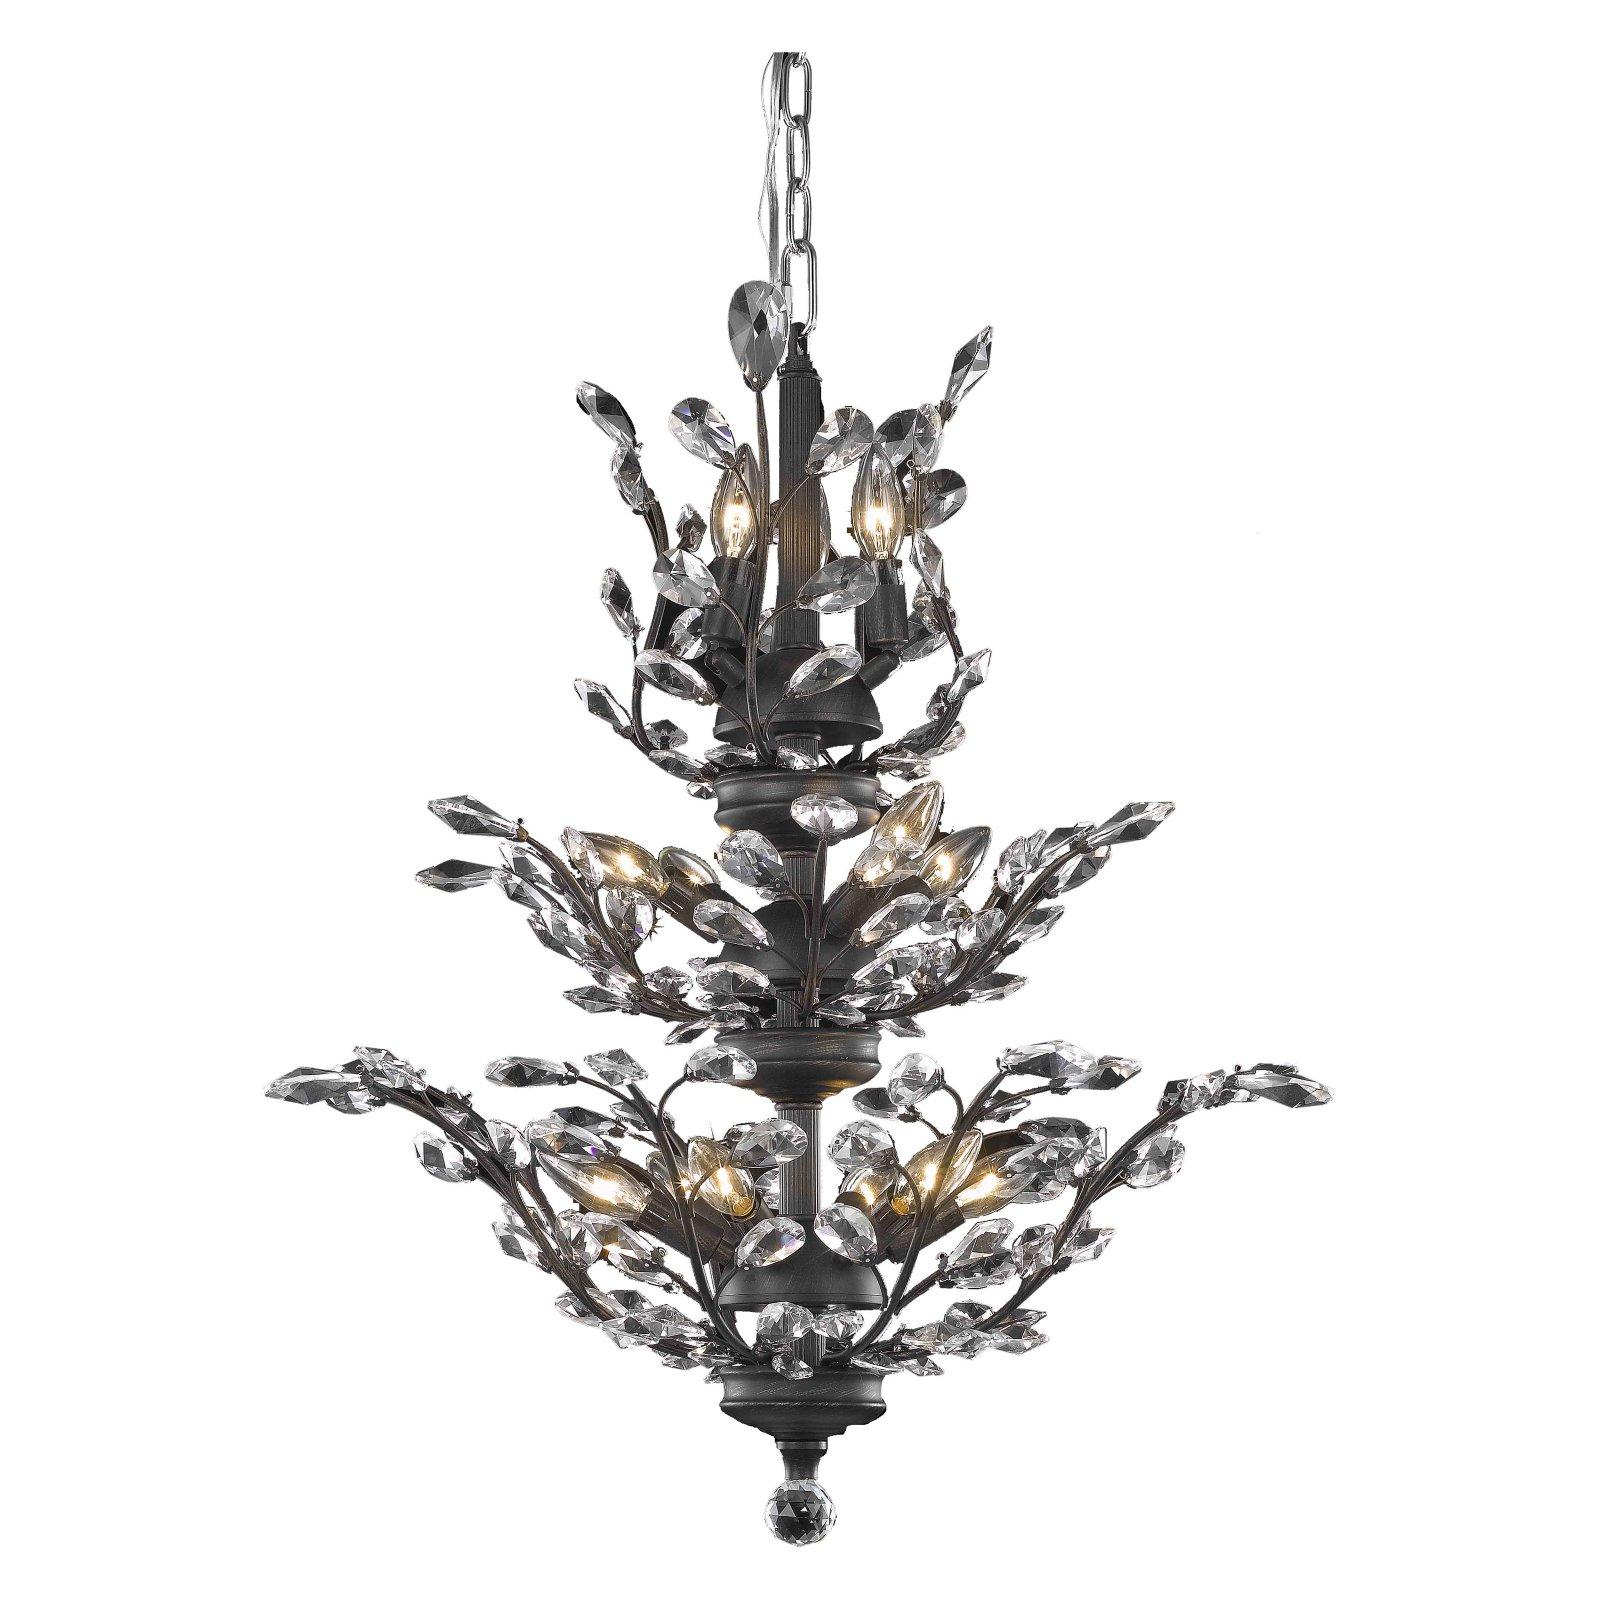 Elegant Lighting Orchid 13 Light Chandelier In